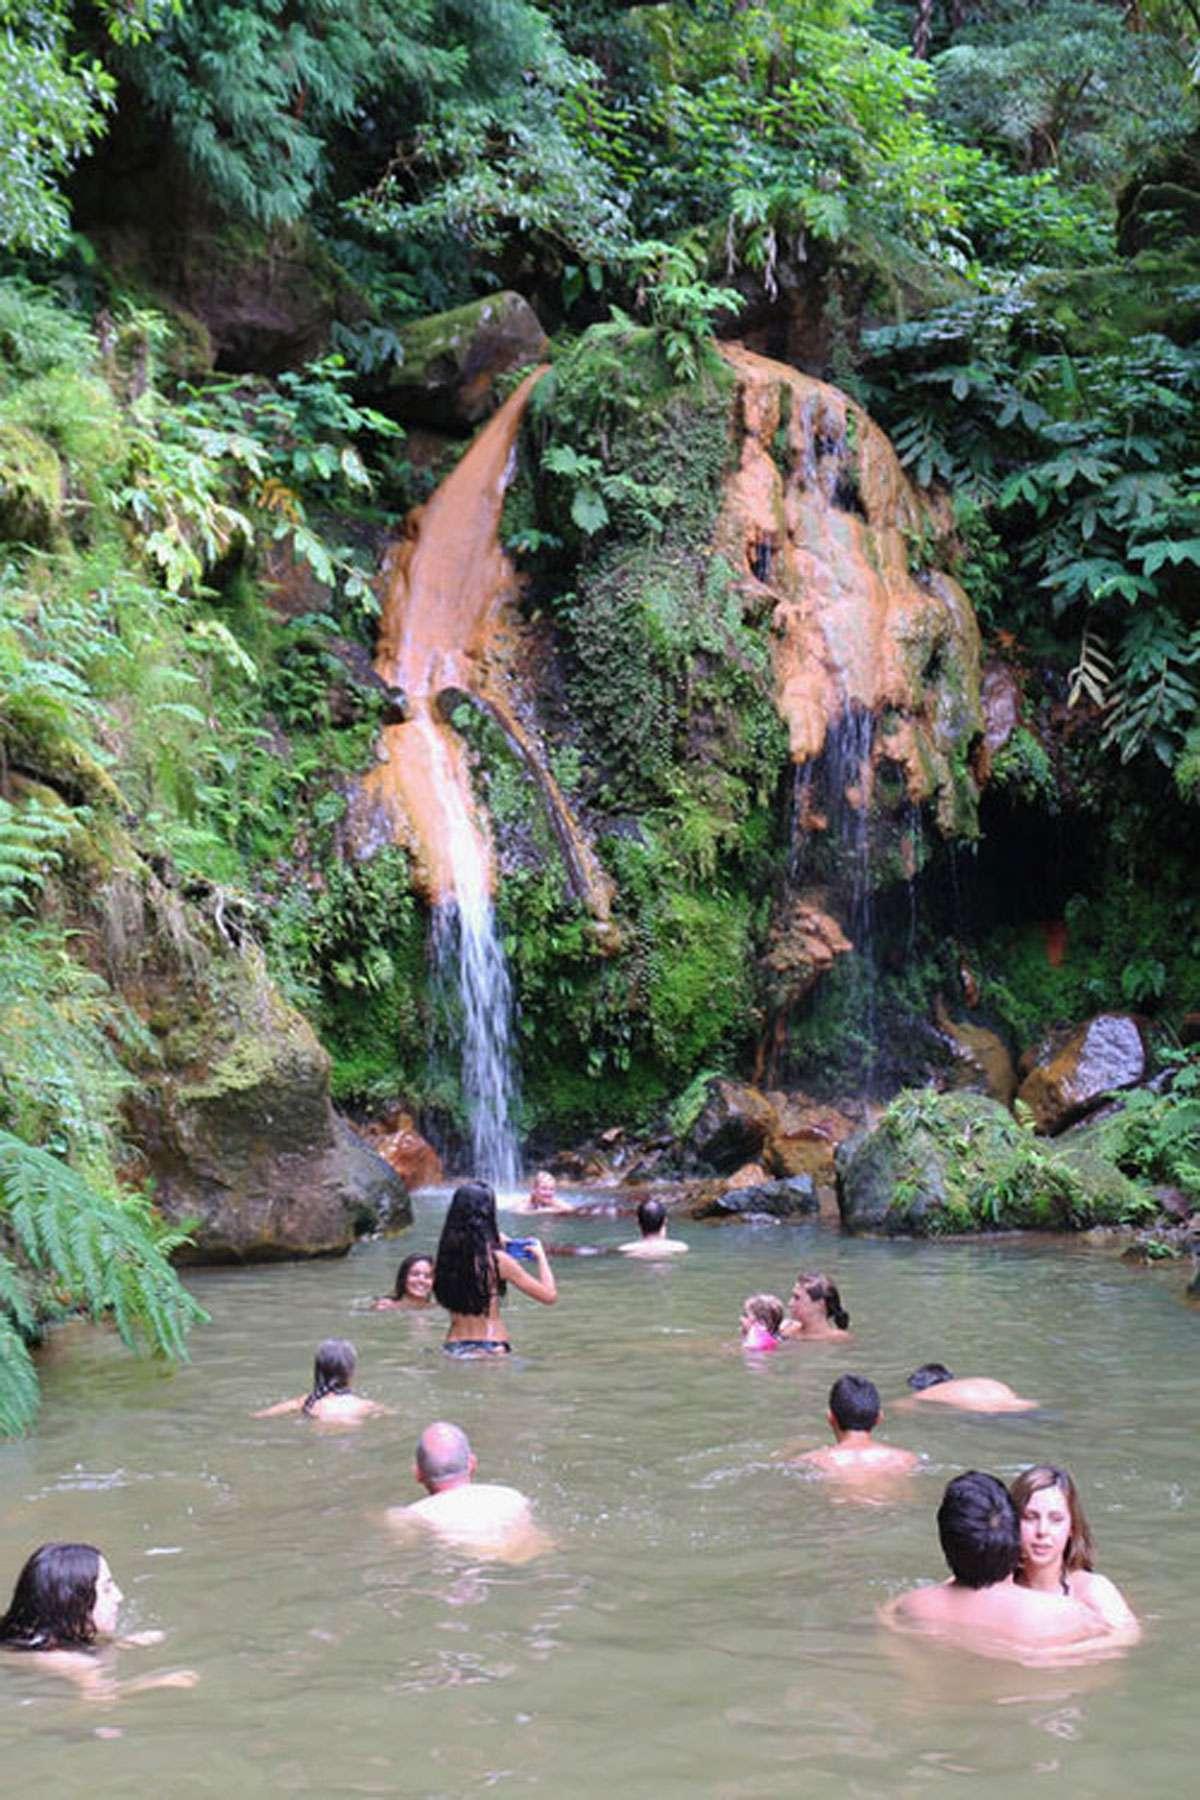 The entrancing aquamarine waters of Lagoa das Sete Cidades